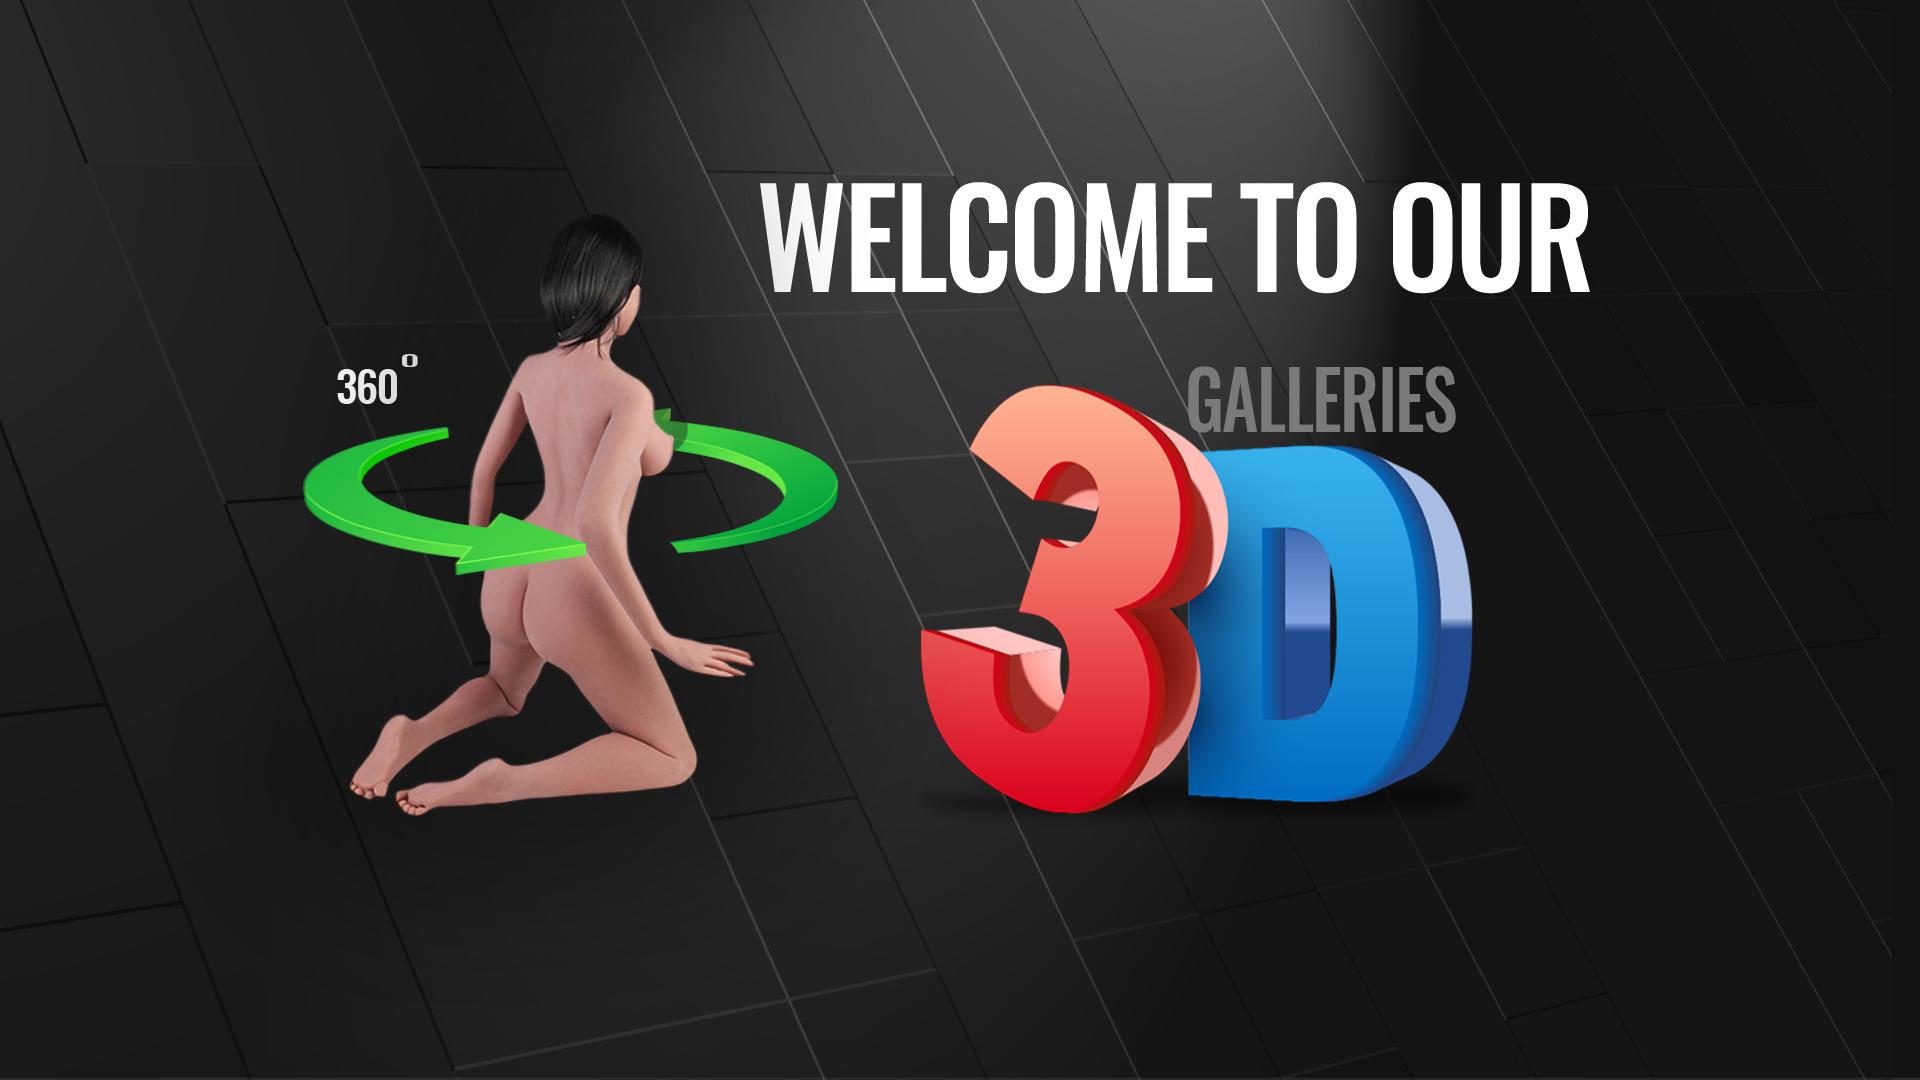 3D sex dolls galleries